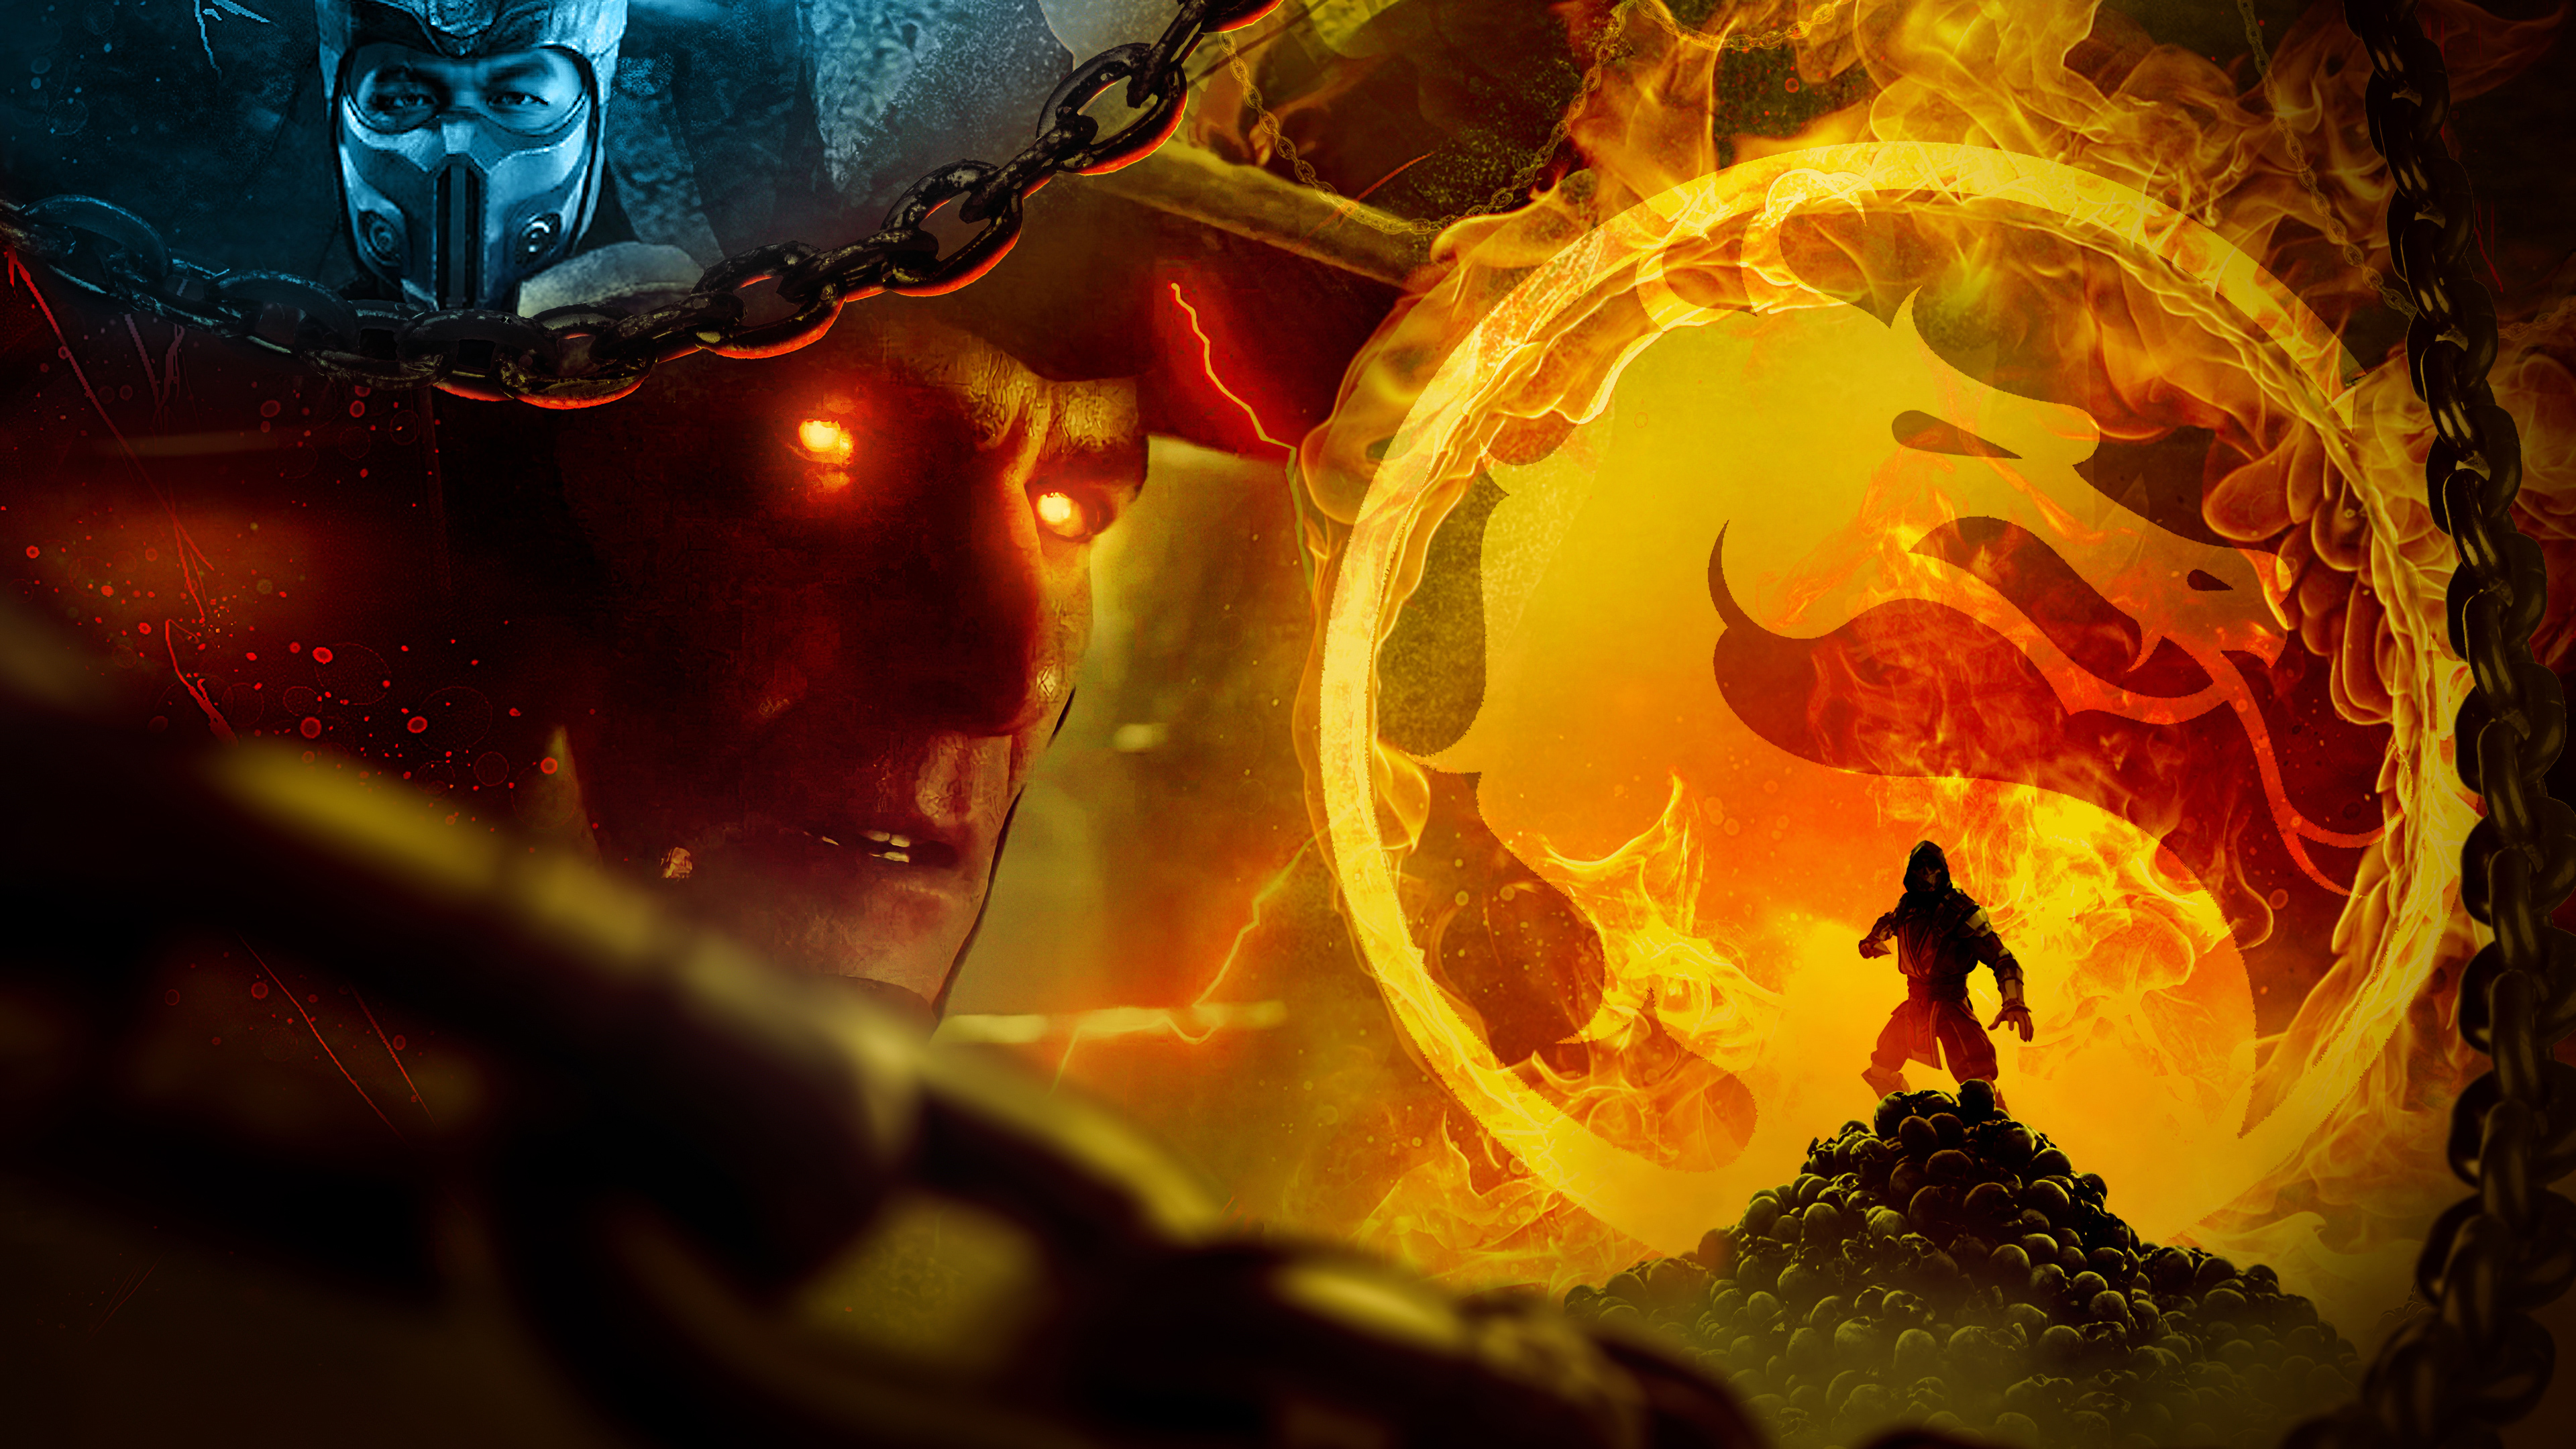 Wallpaper Mortal Kombat art